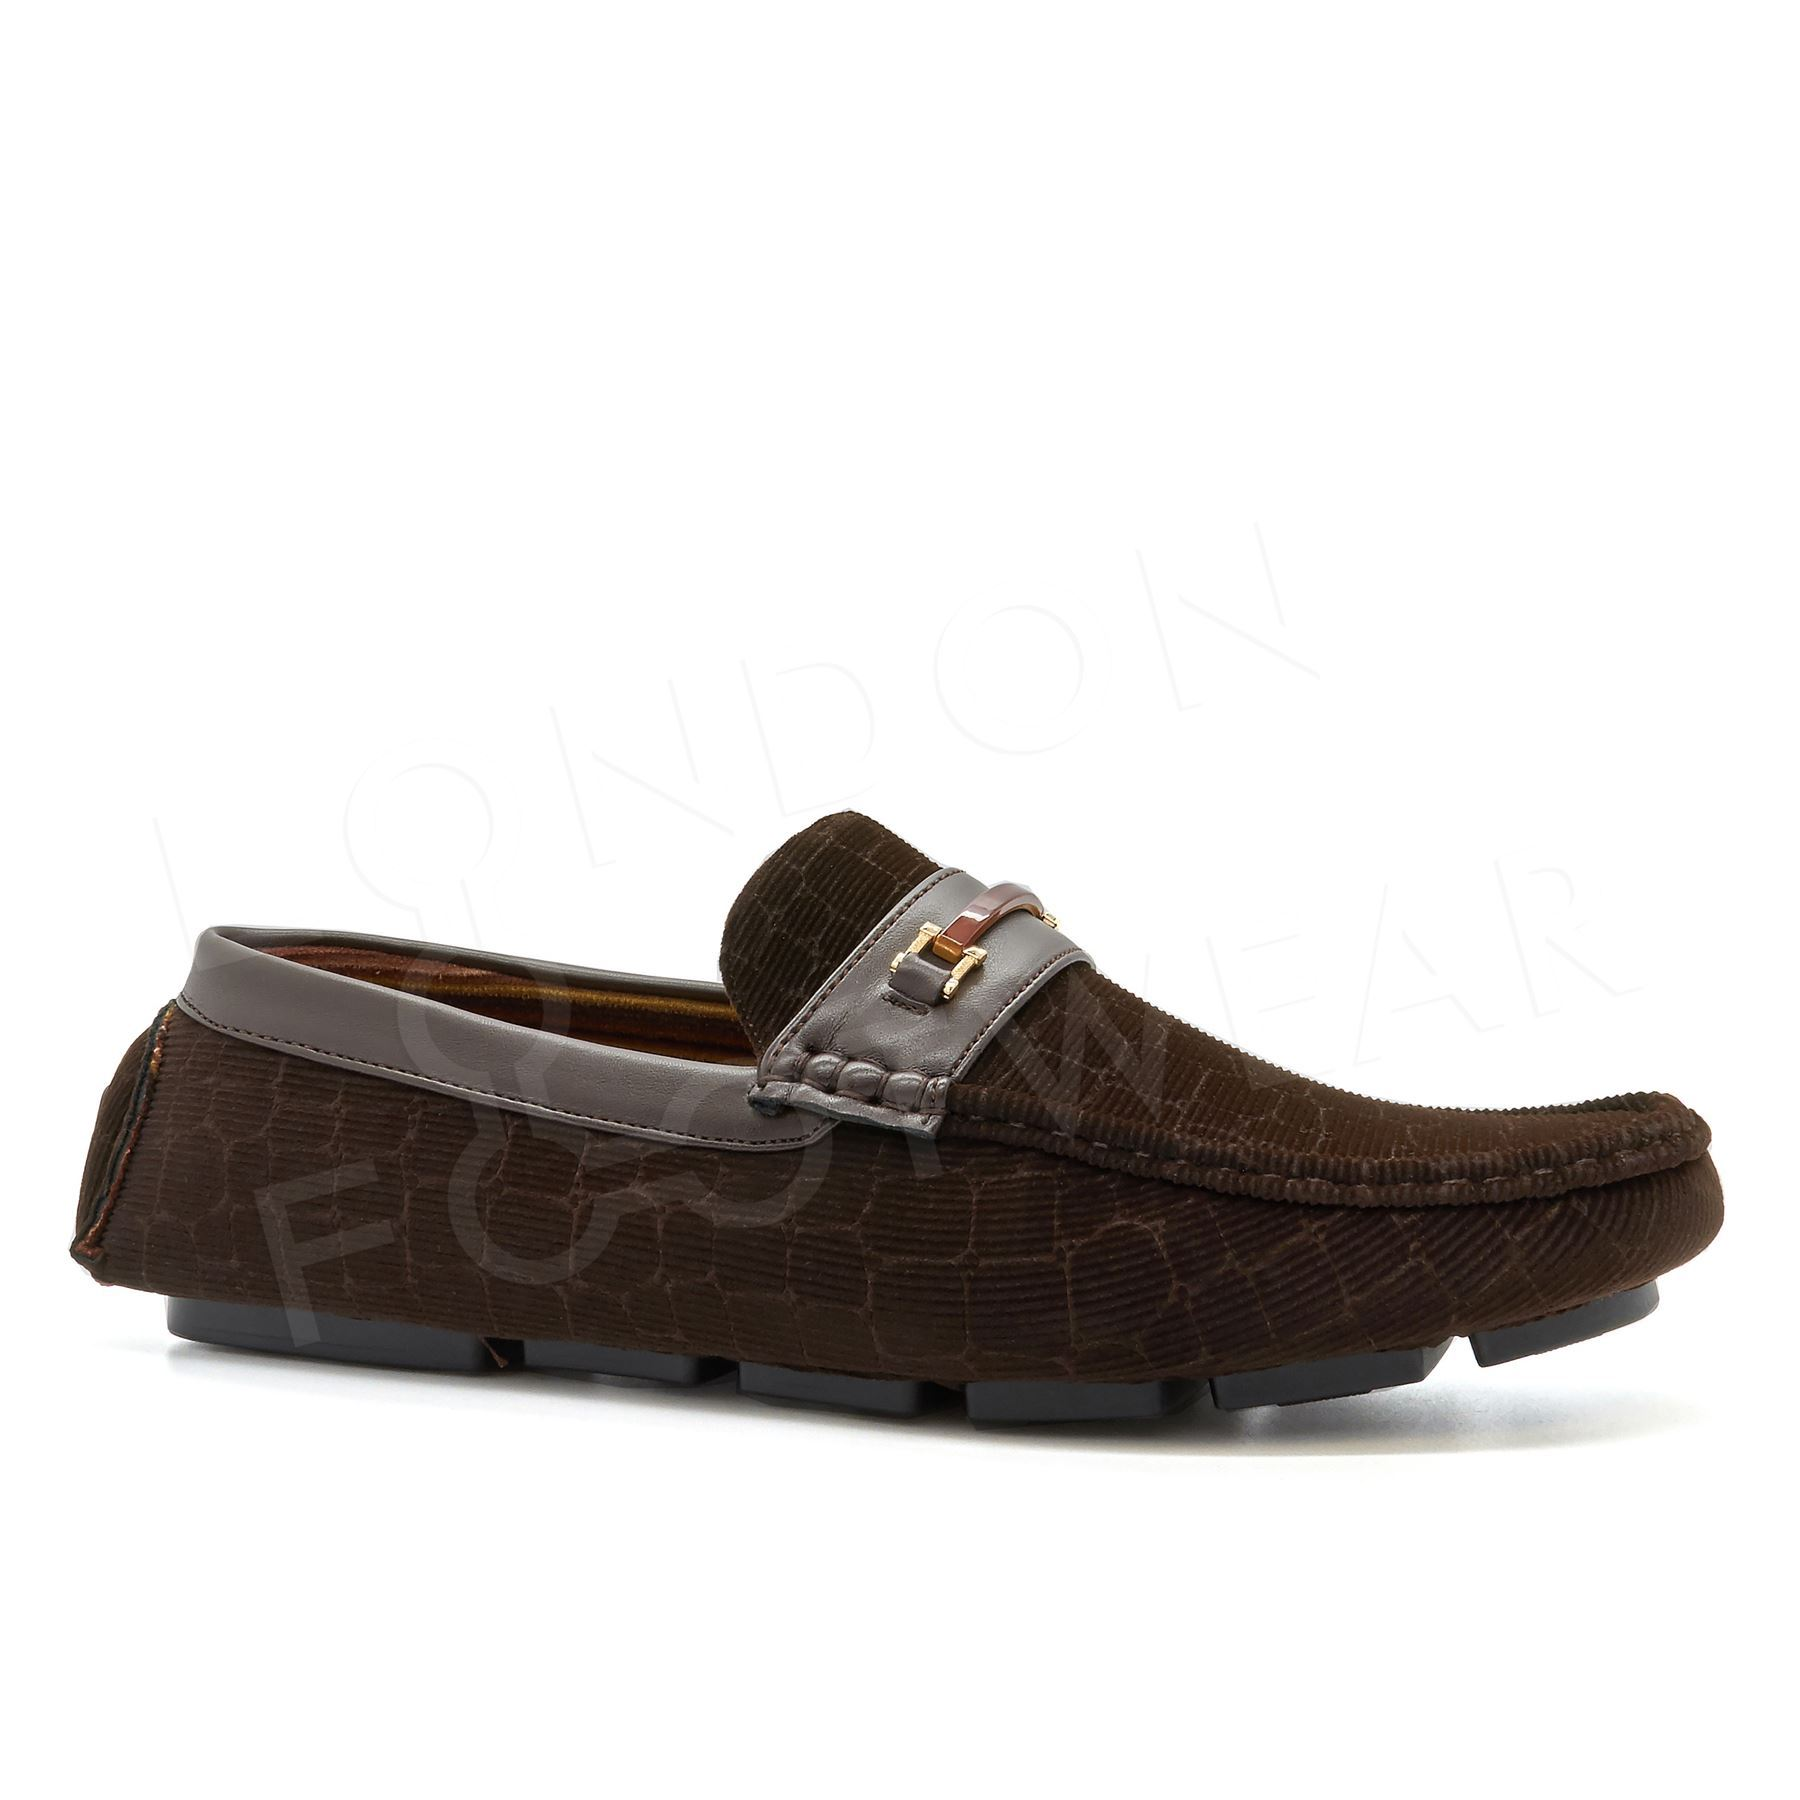 Italian Boat Shoes Mens